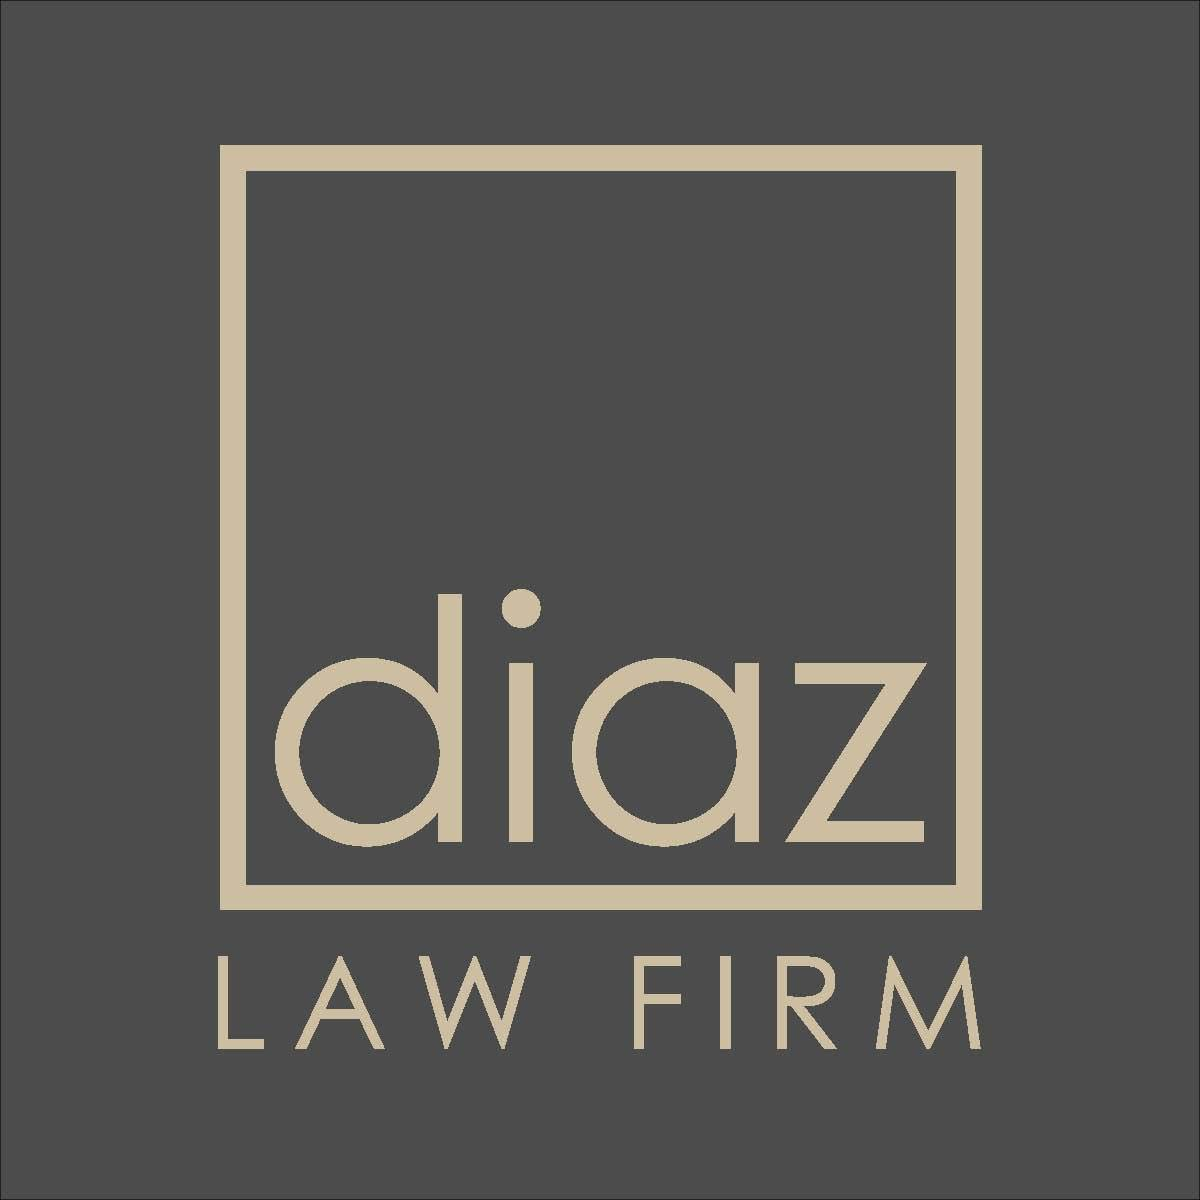 Diaz Law Firm image 1